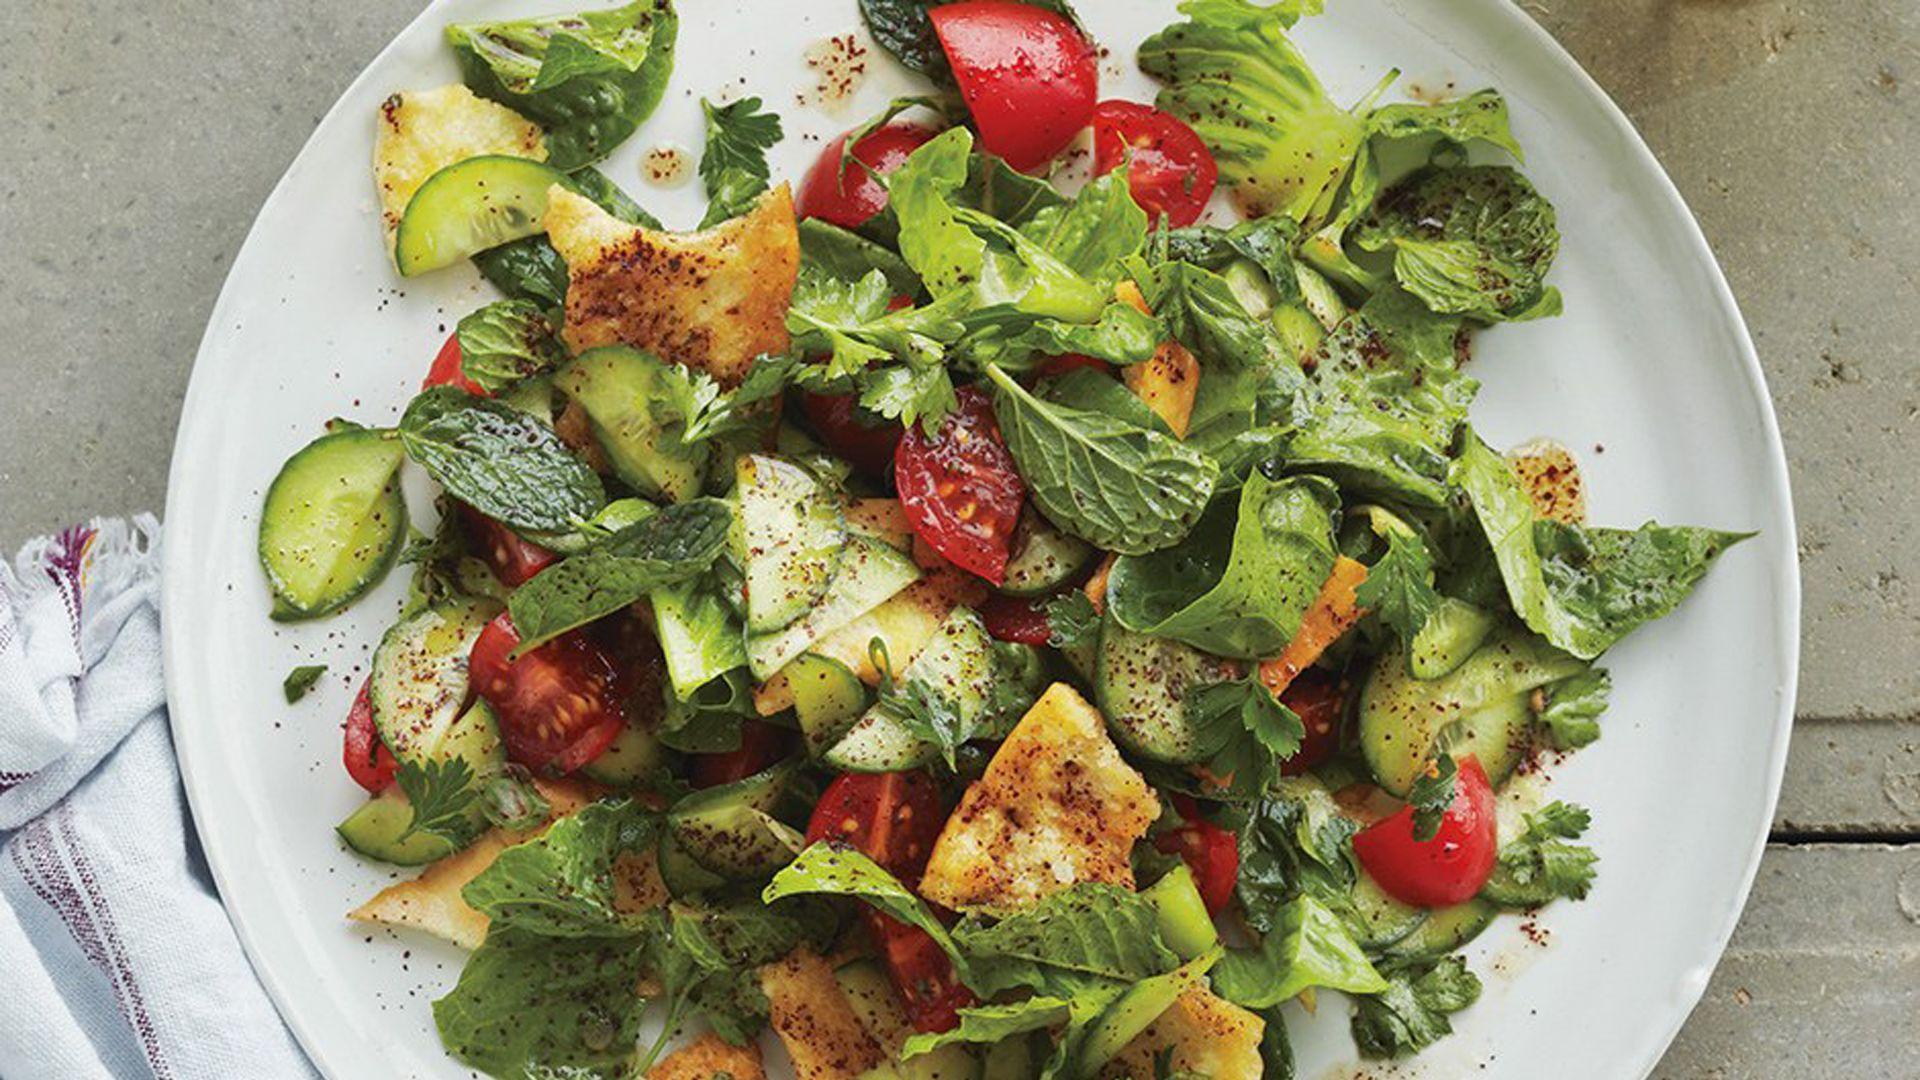 How To Assemble Lebanon's Most Famous Salad, Fattoush